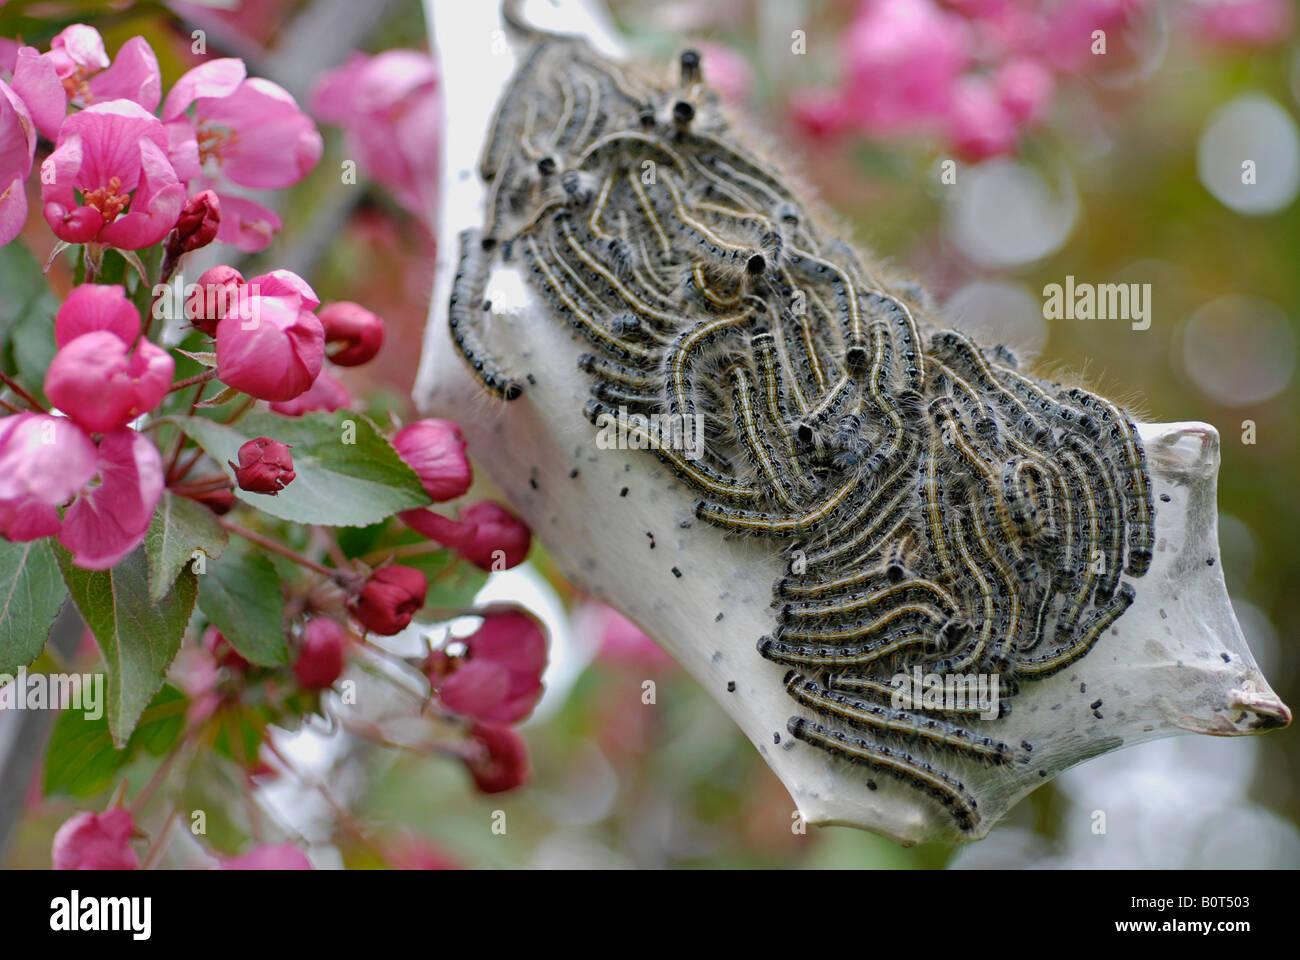 Tent Caterpillar Nest in Crab Apple Tree - Stock Image